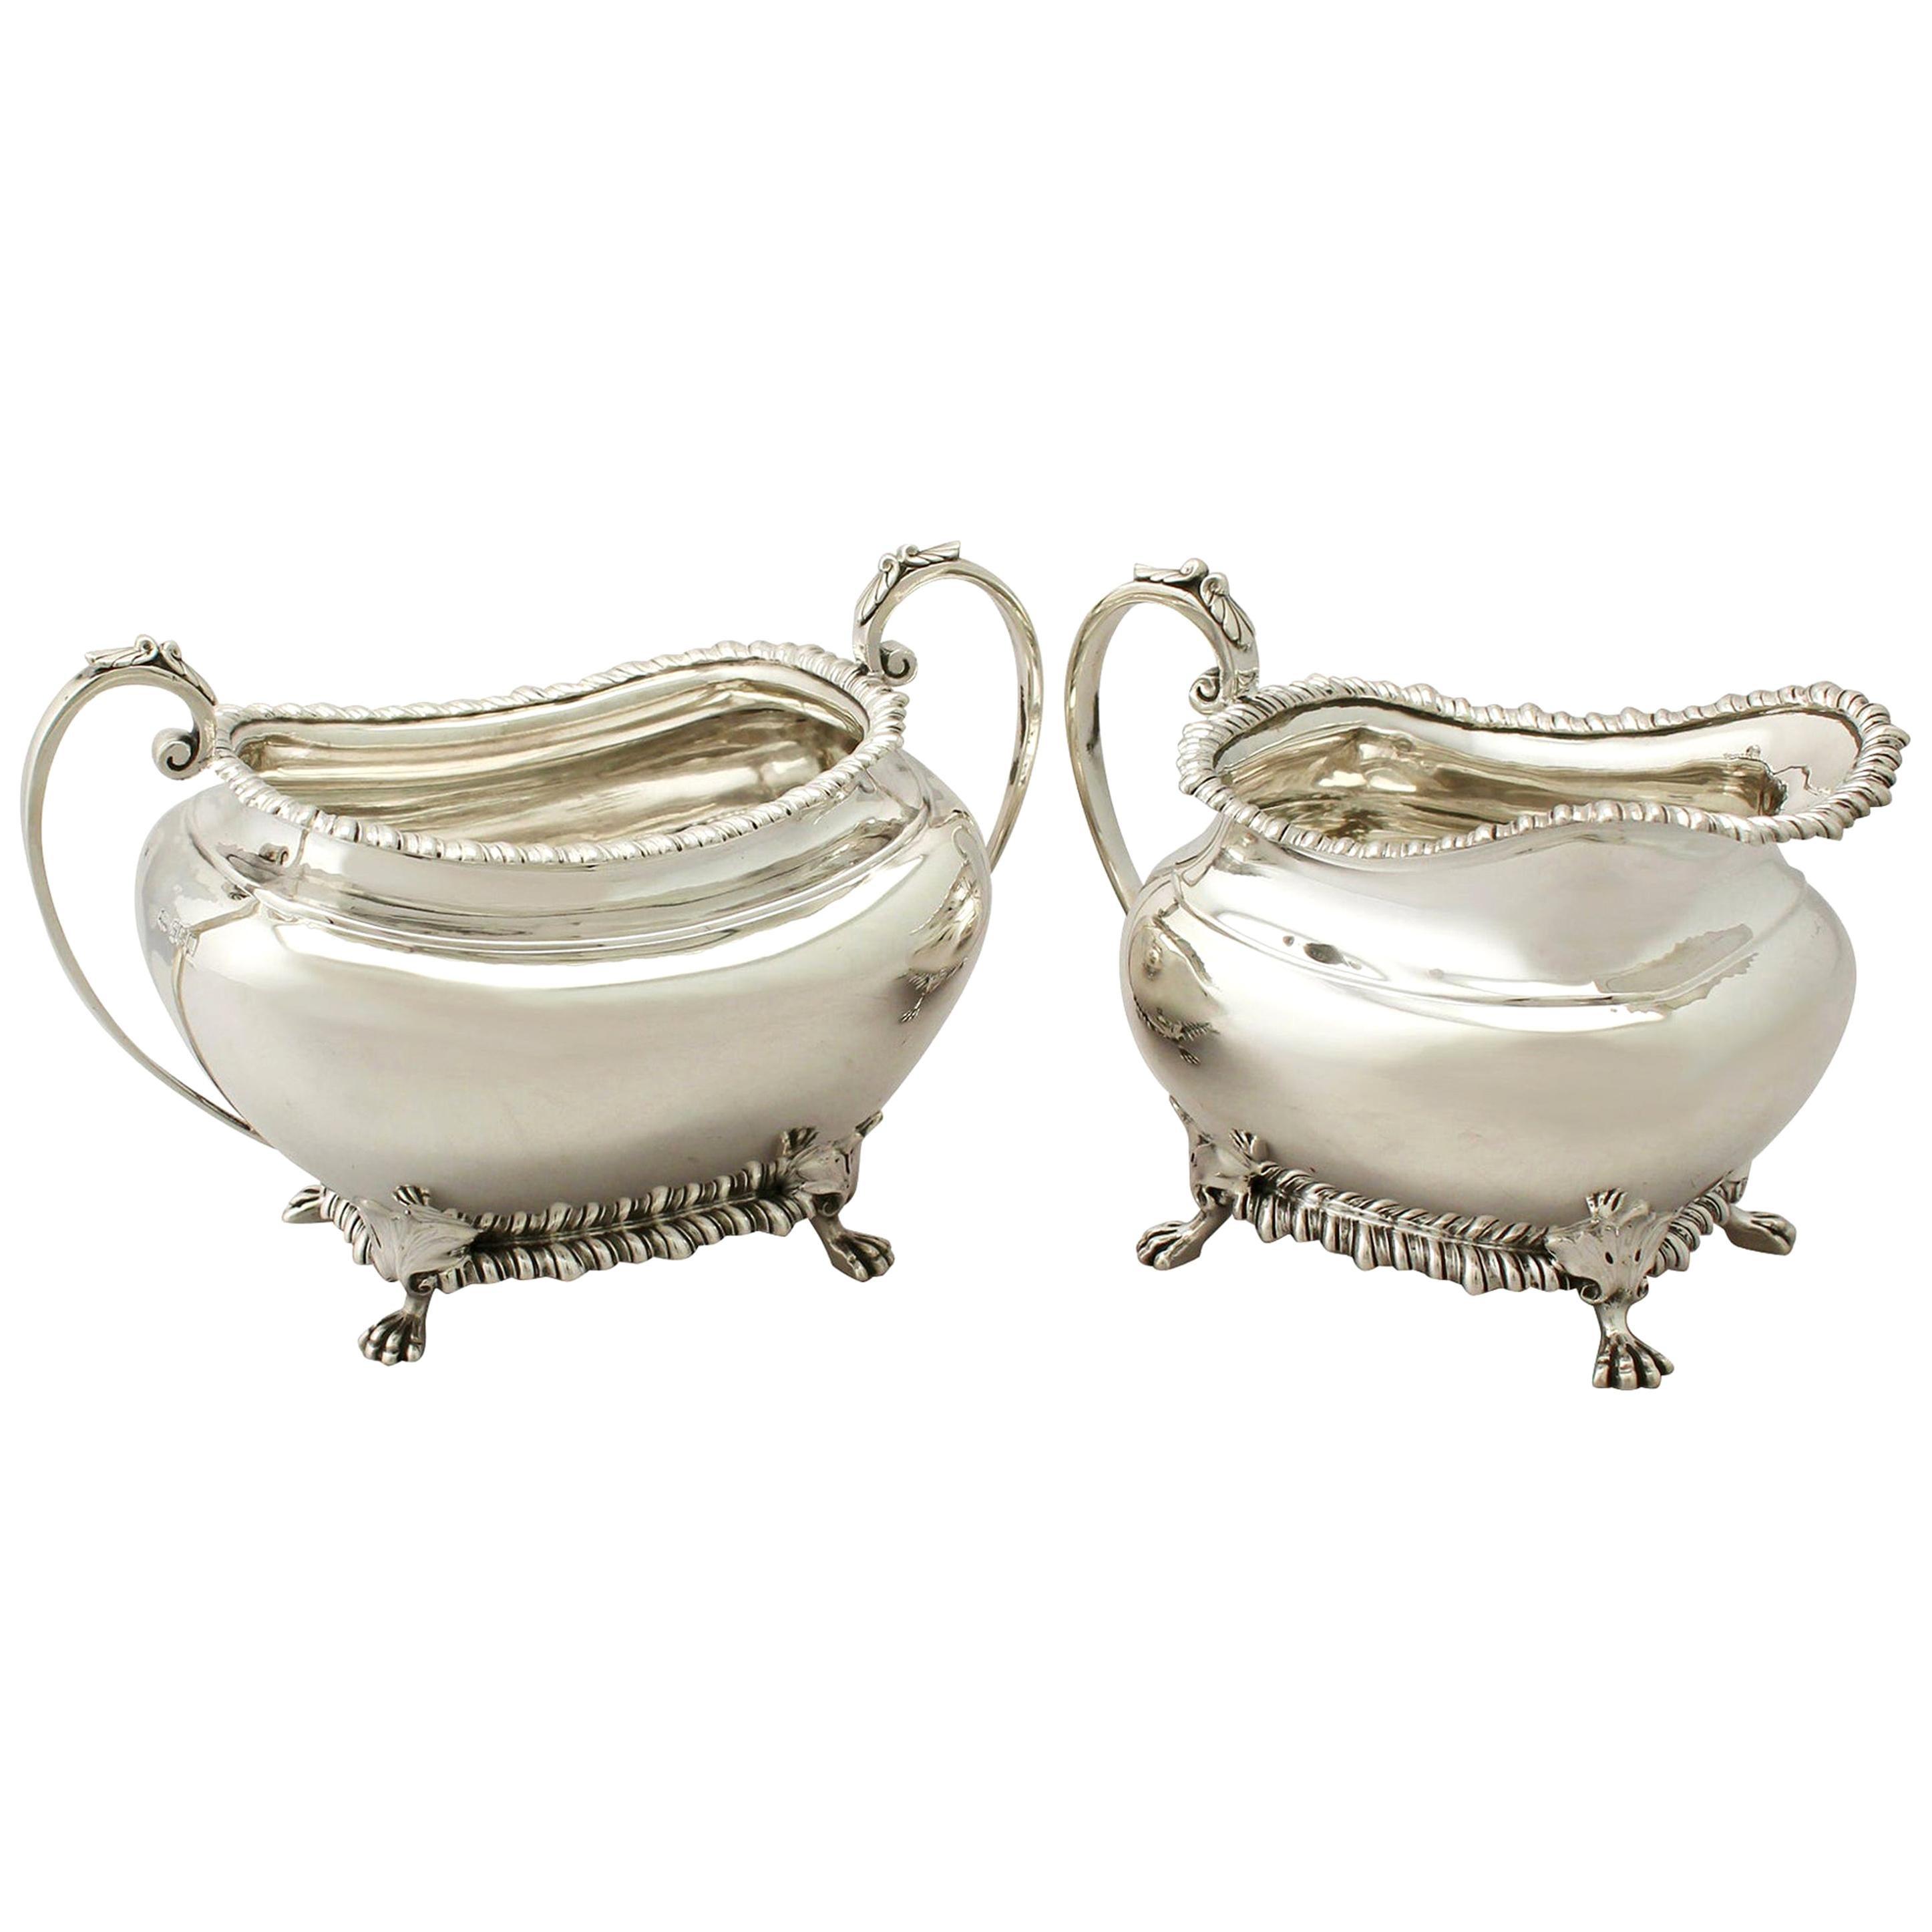 Antique Edwardian Sterling Silver Cream Jug or Creamer and Sugar Bowl